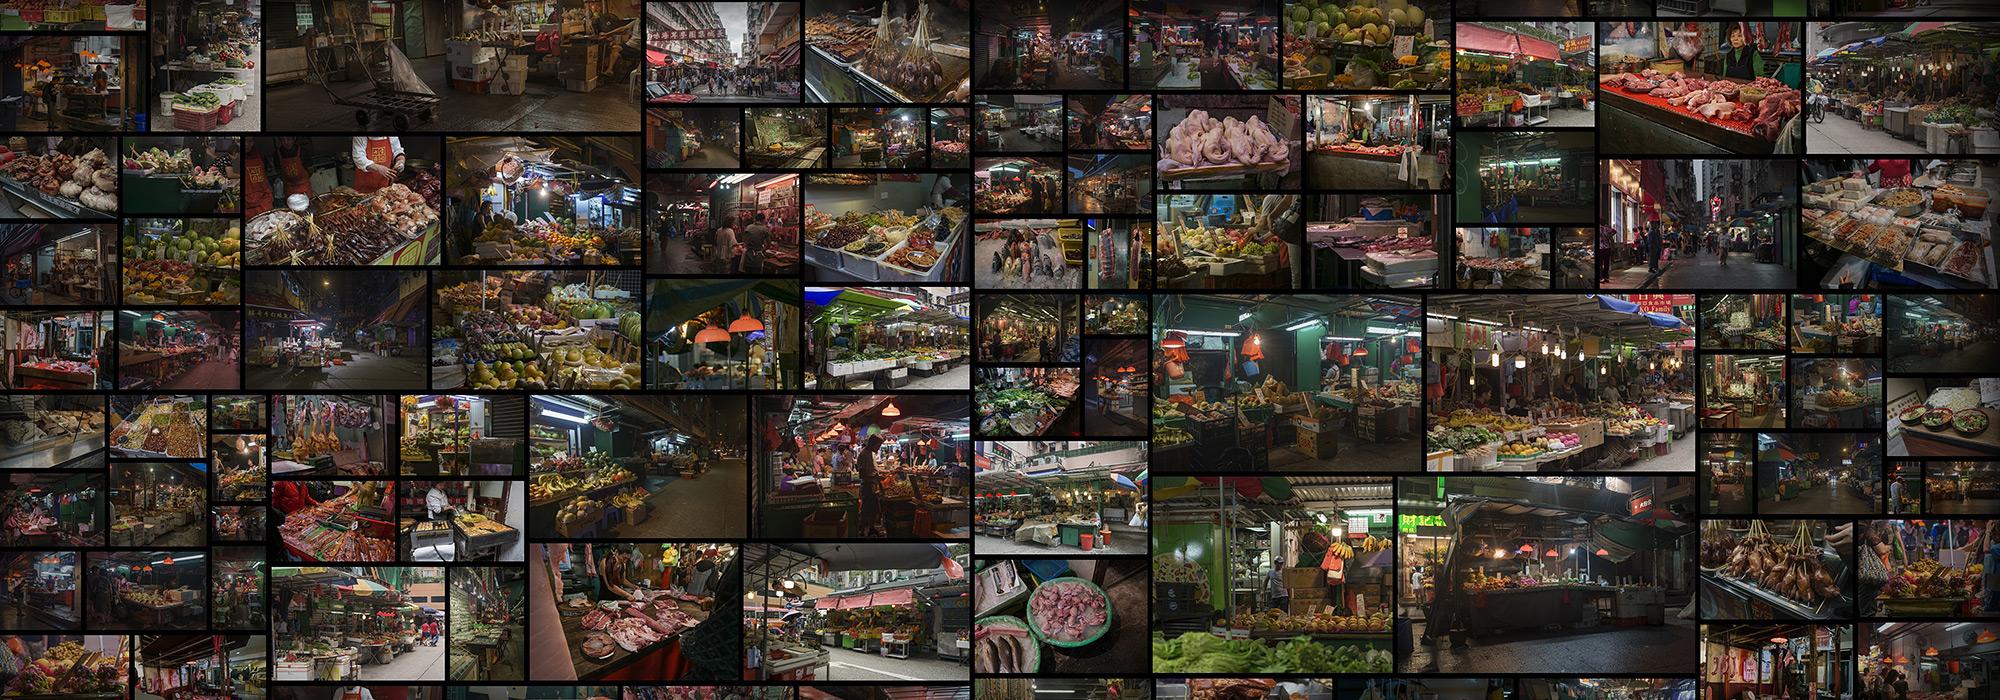 AsianMarketNightShops